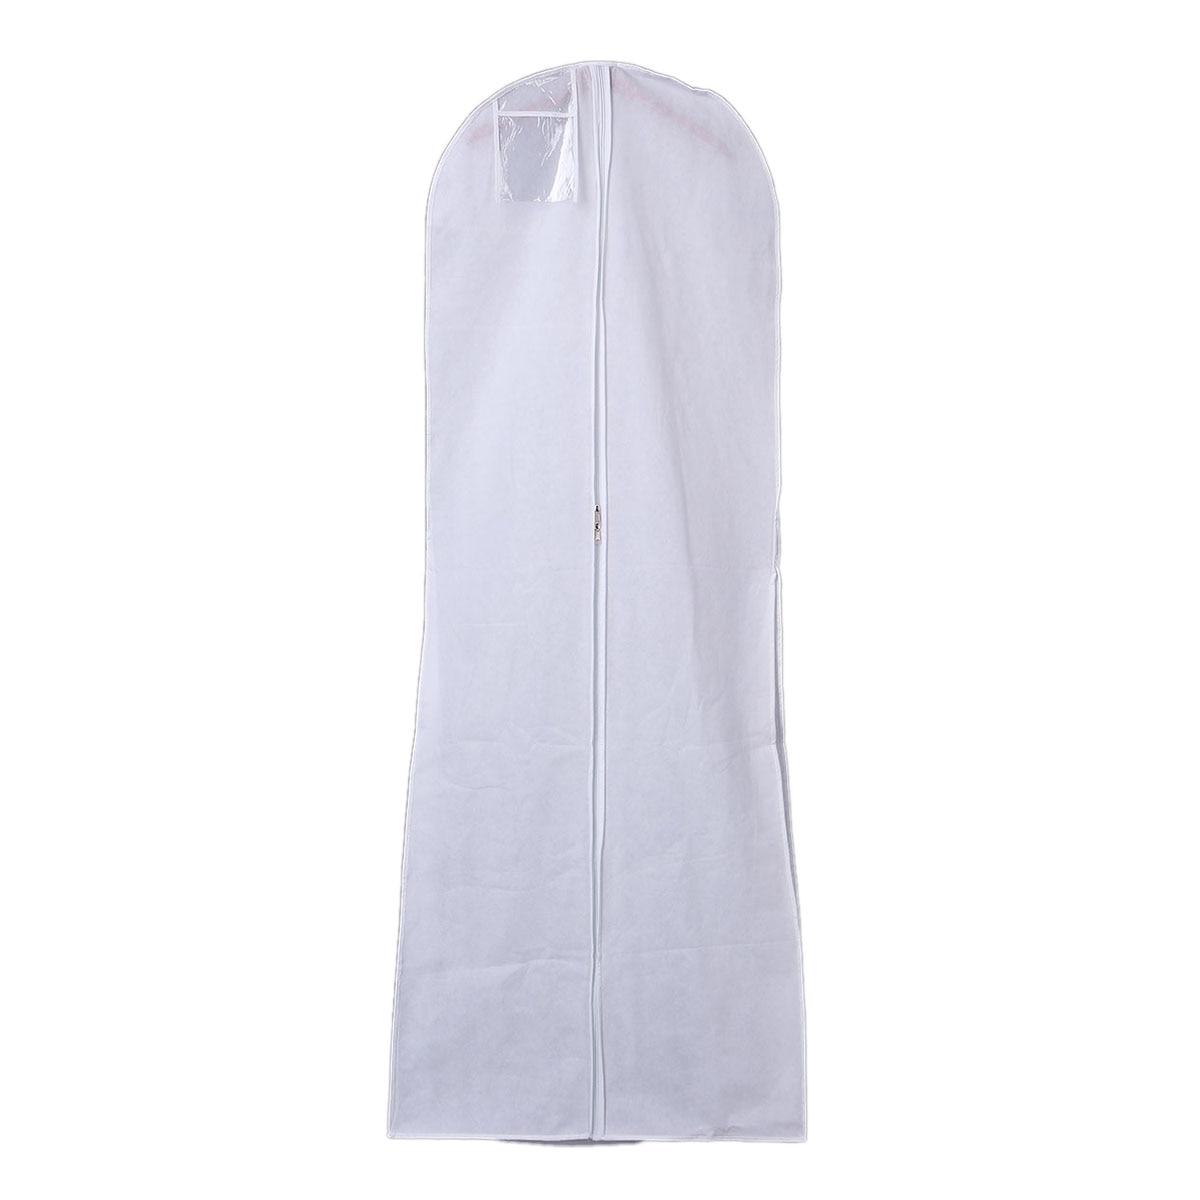 Wedding Gown Preservation Bag: Hanging Wedding Dress Bridal Gown Garment Cover Storage